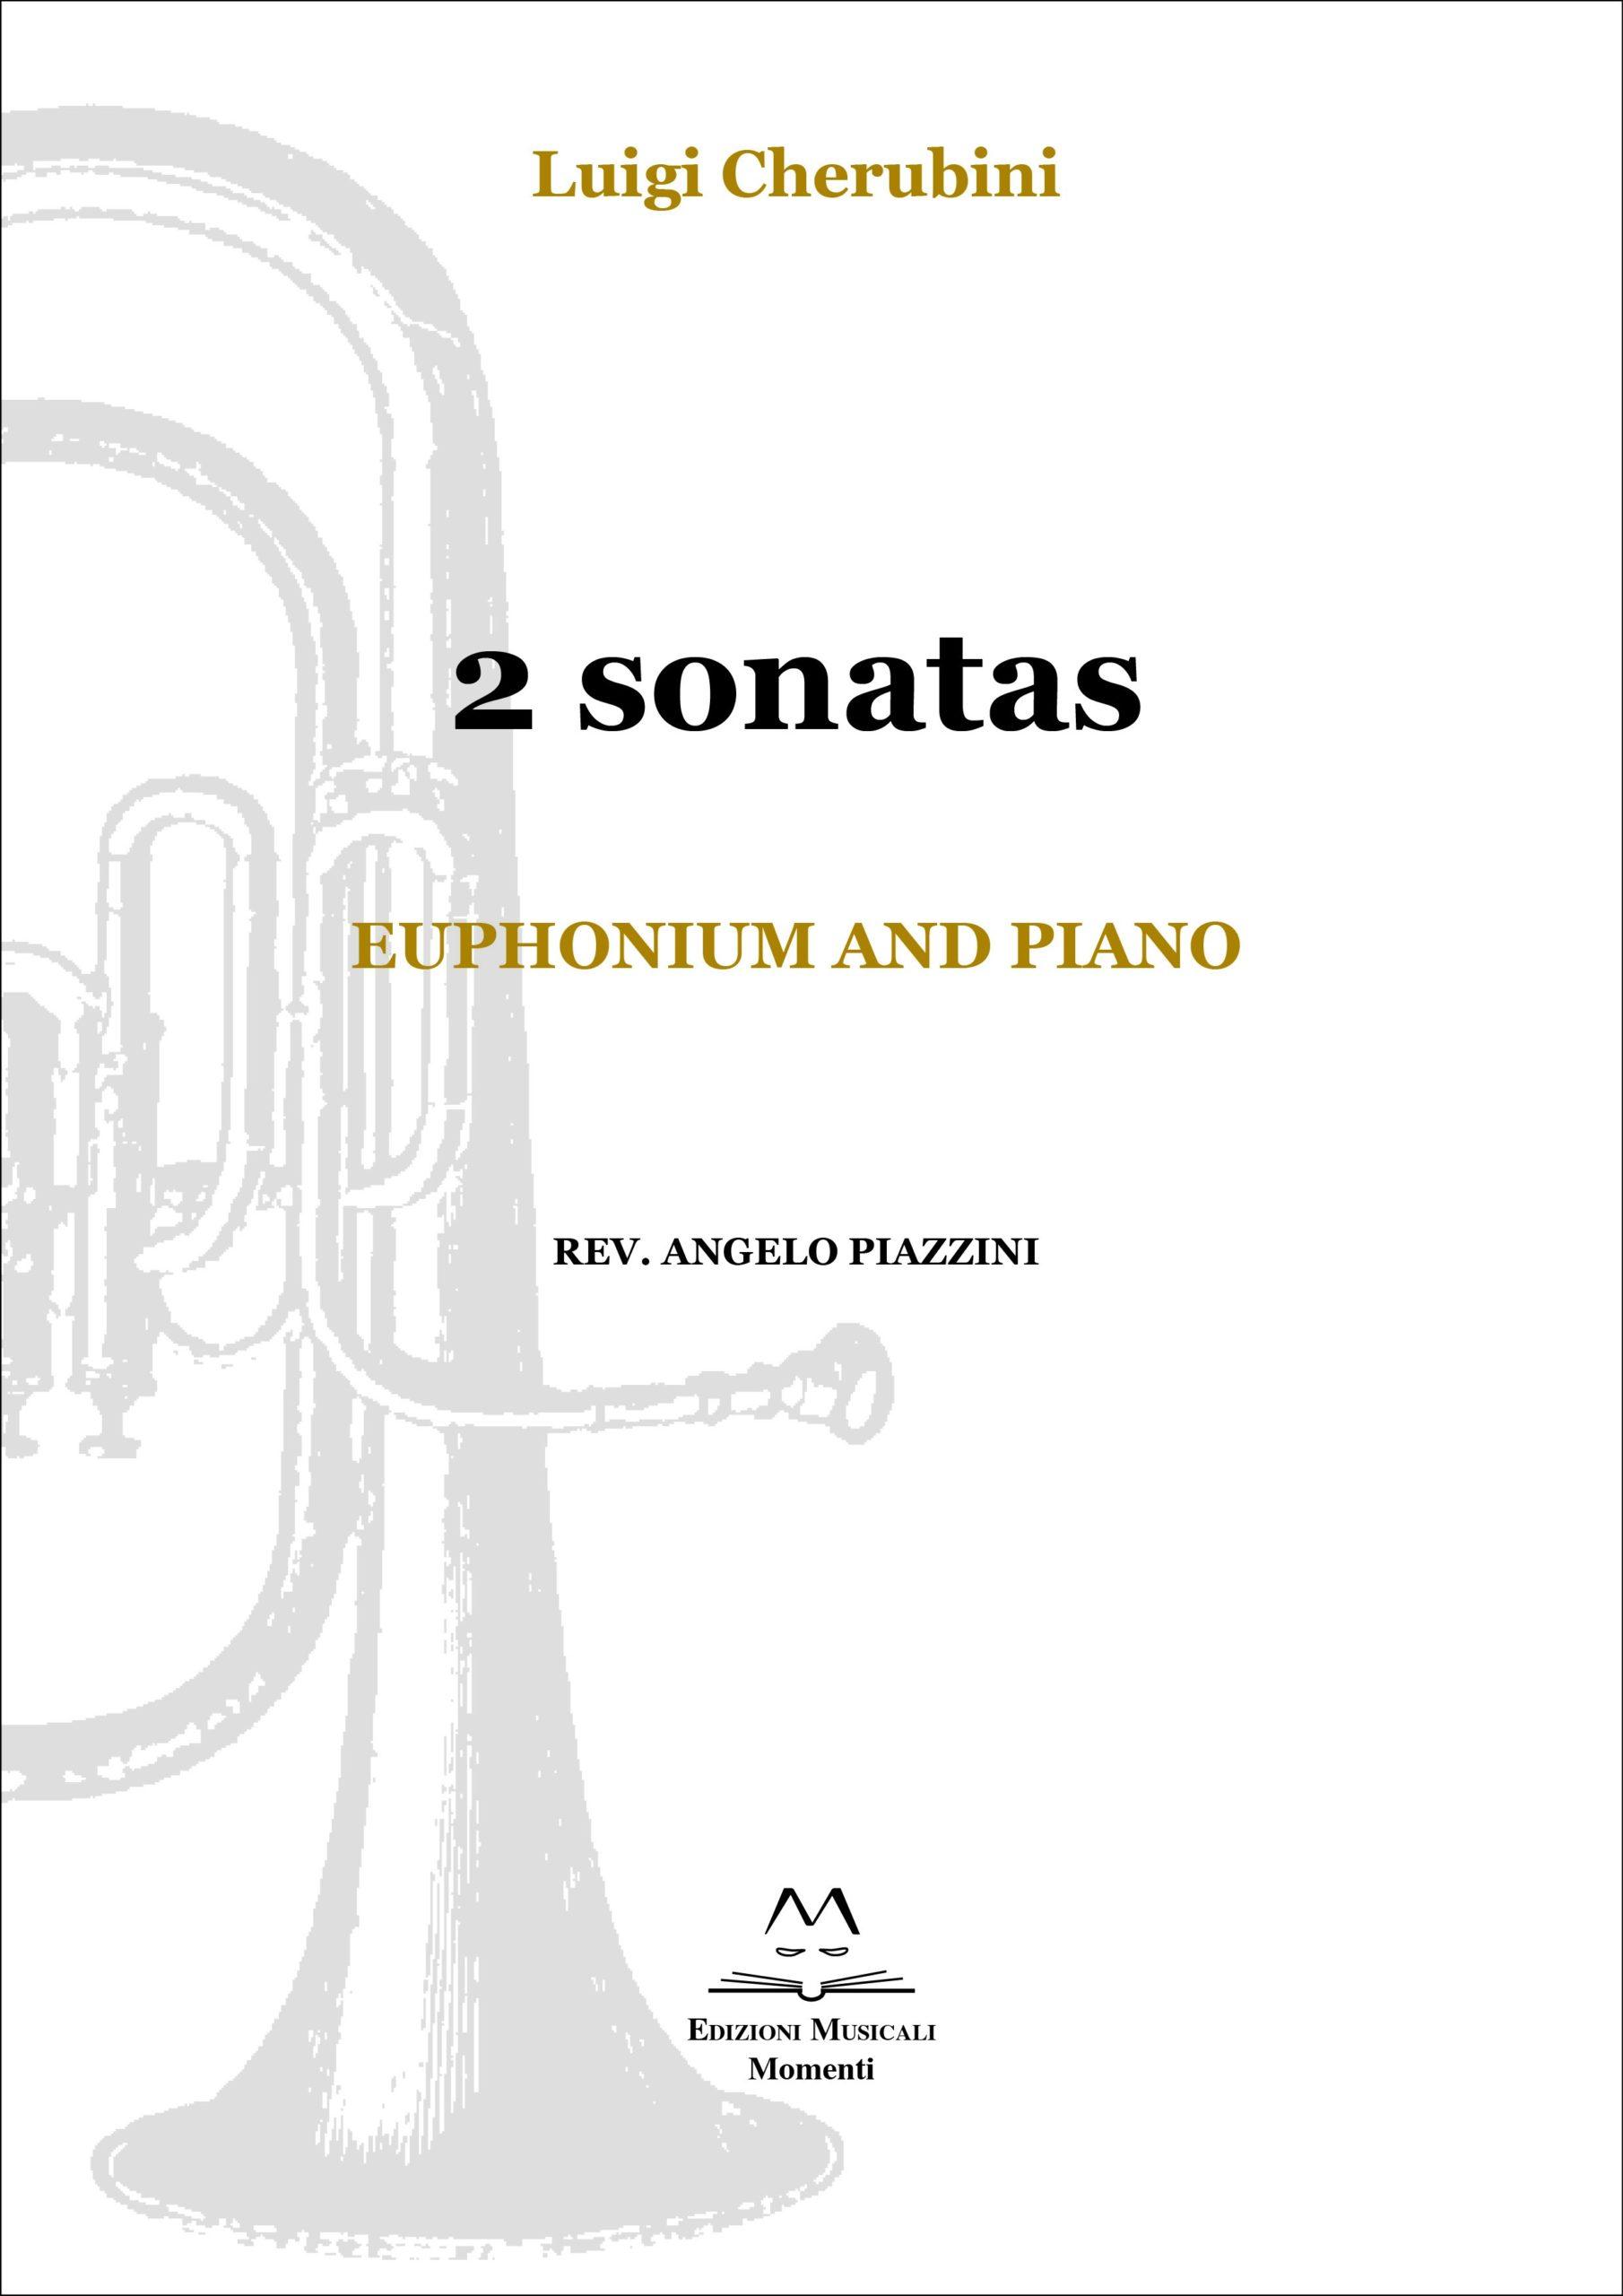 2 sonatas. Euphonium and piano rev. Angelo Piazzini